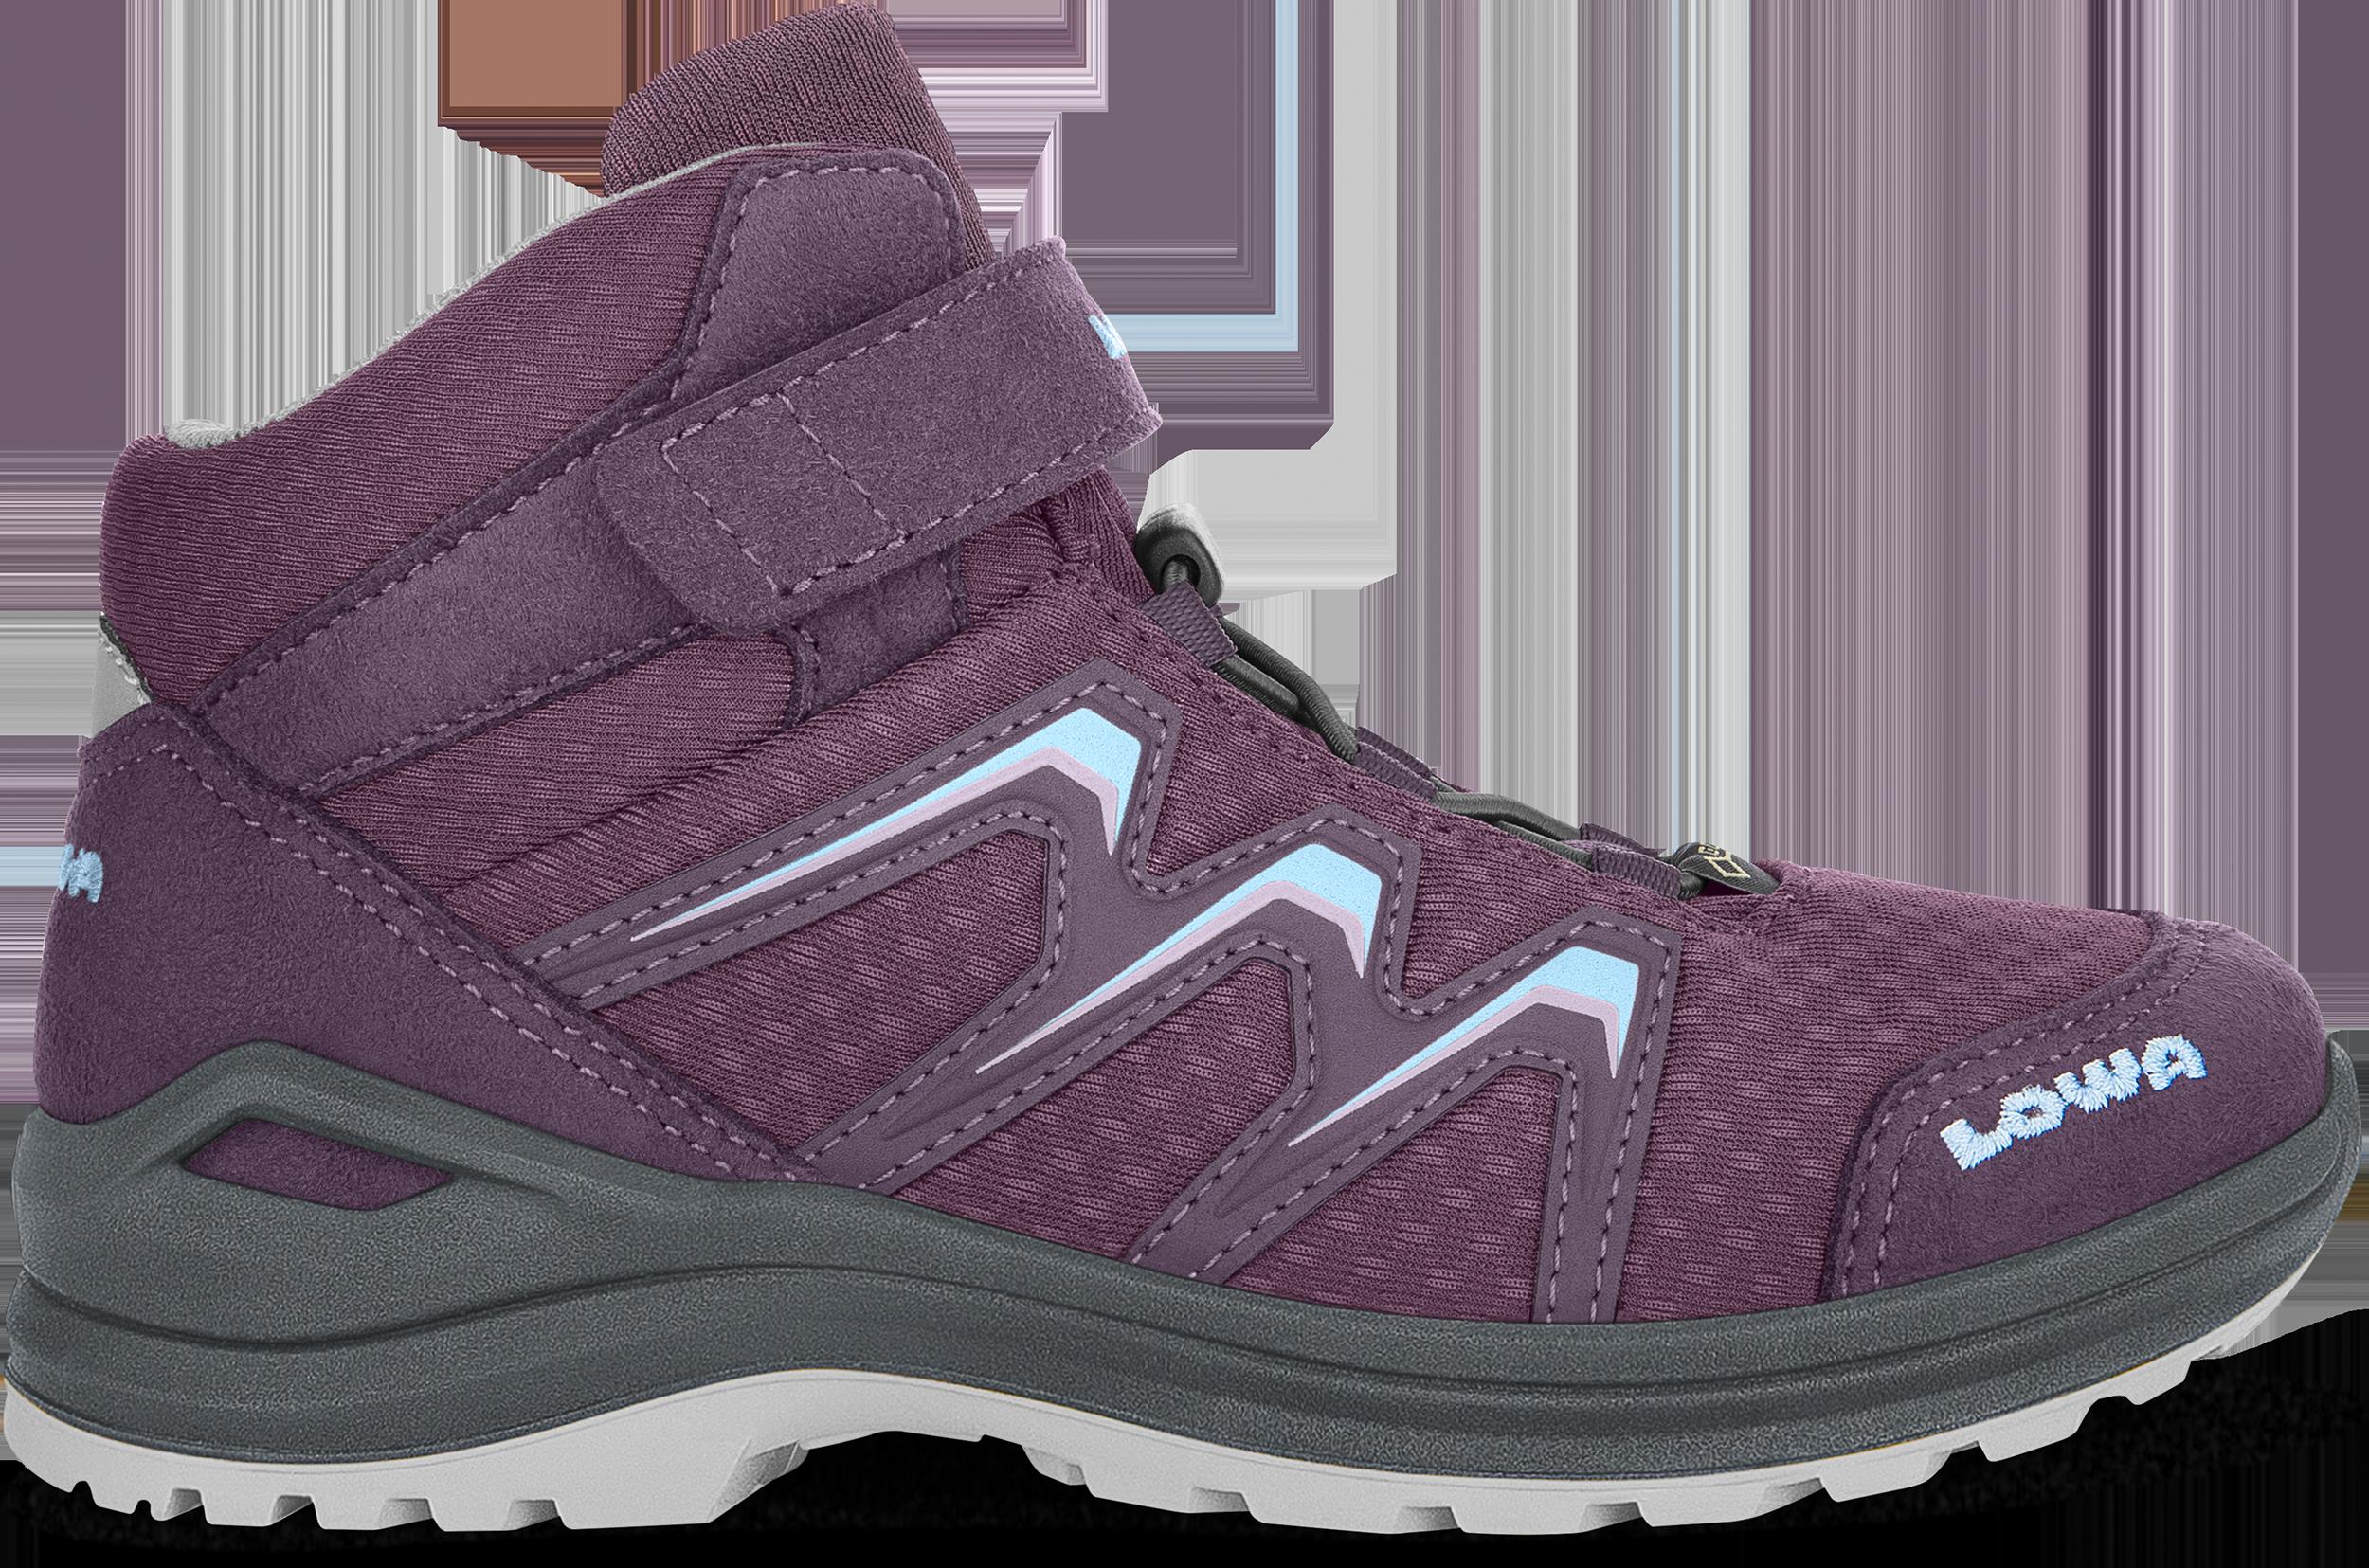 Maddox Gtx Mid Junior All Terrain Sport Shoes For Kids Lowa En